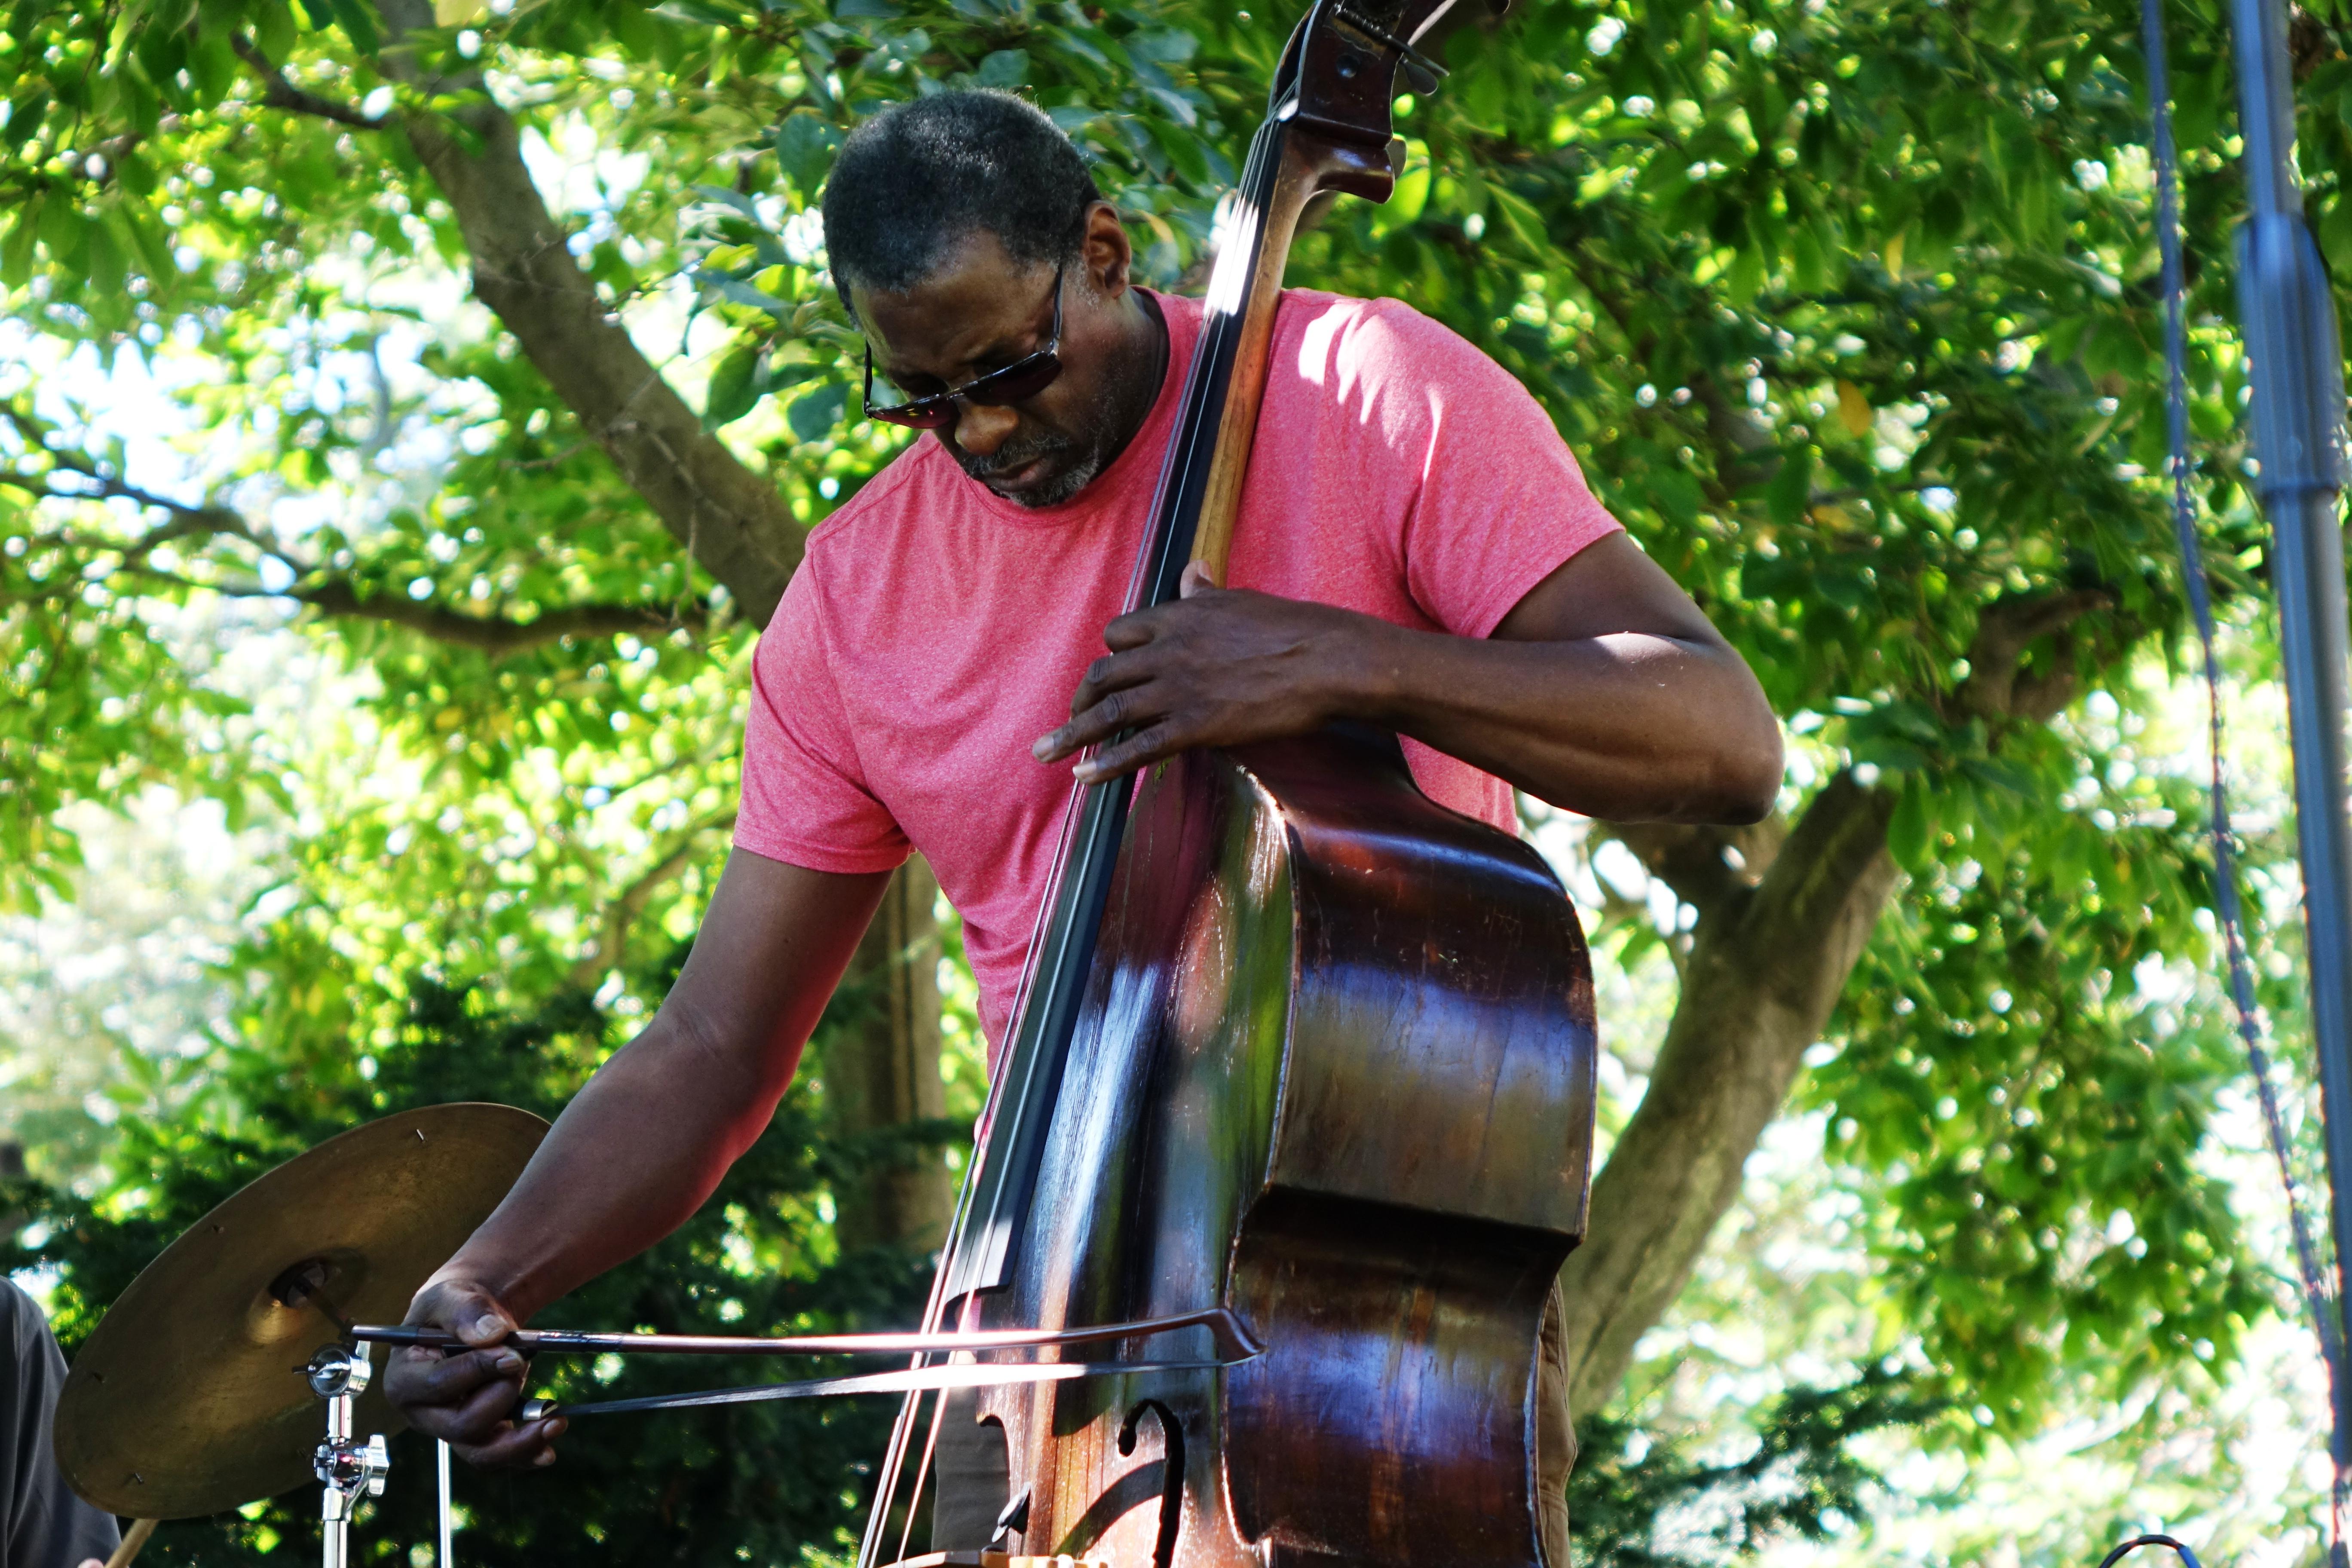 Larry Roland in Corlears Hook Park in September 2017